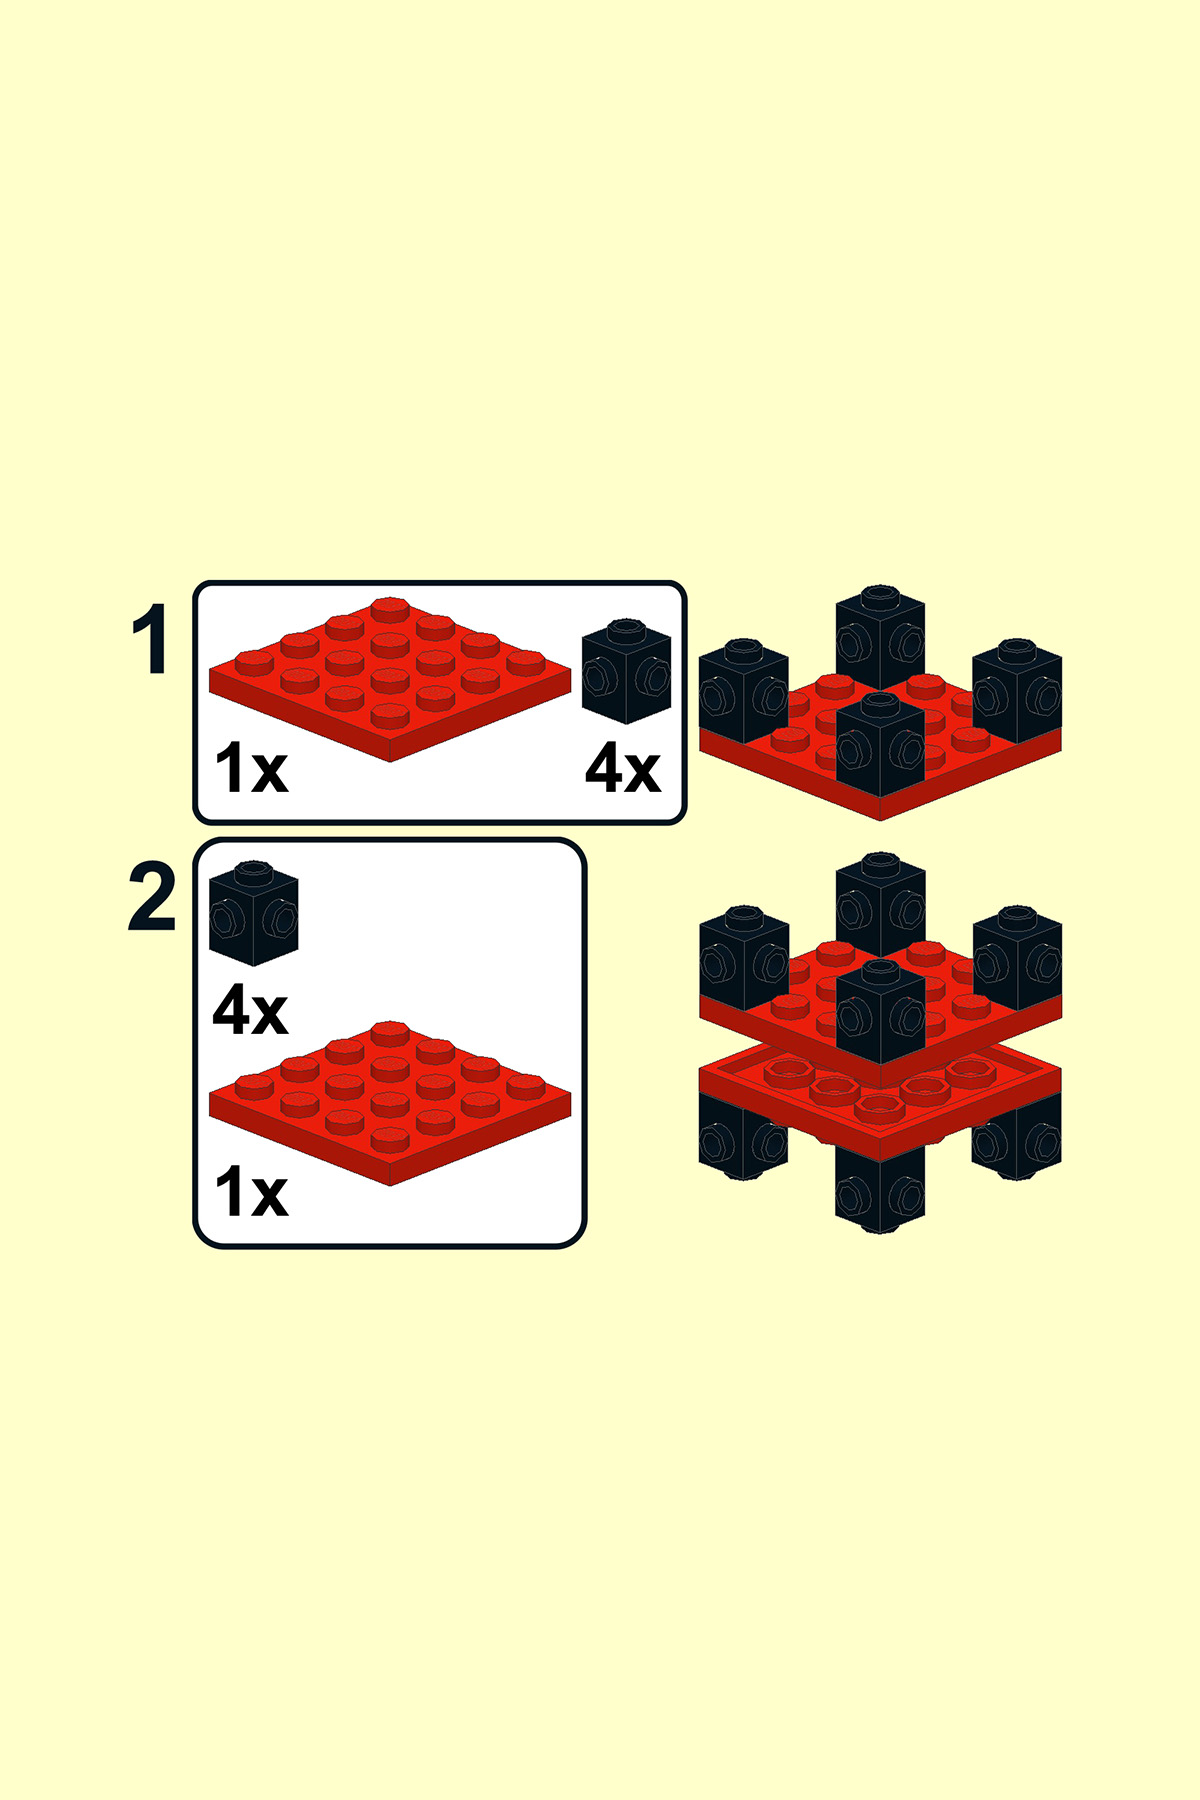 Orn-guide-4x6 03.jpg